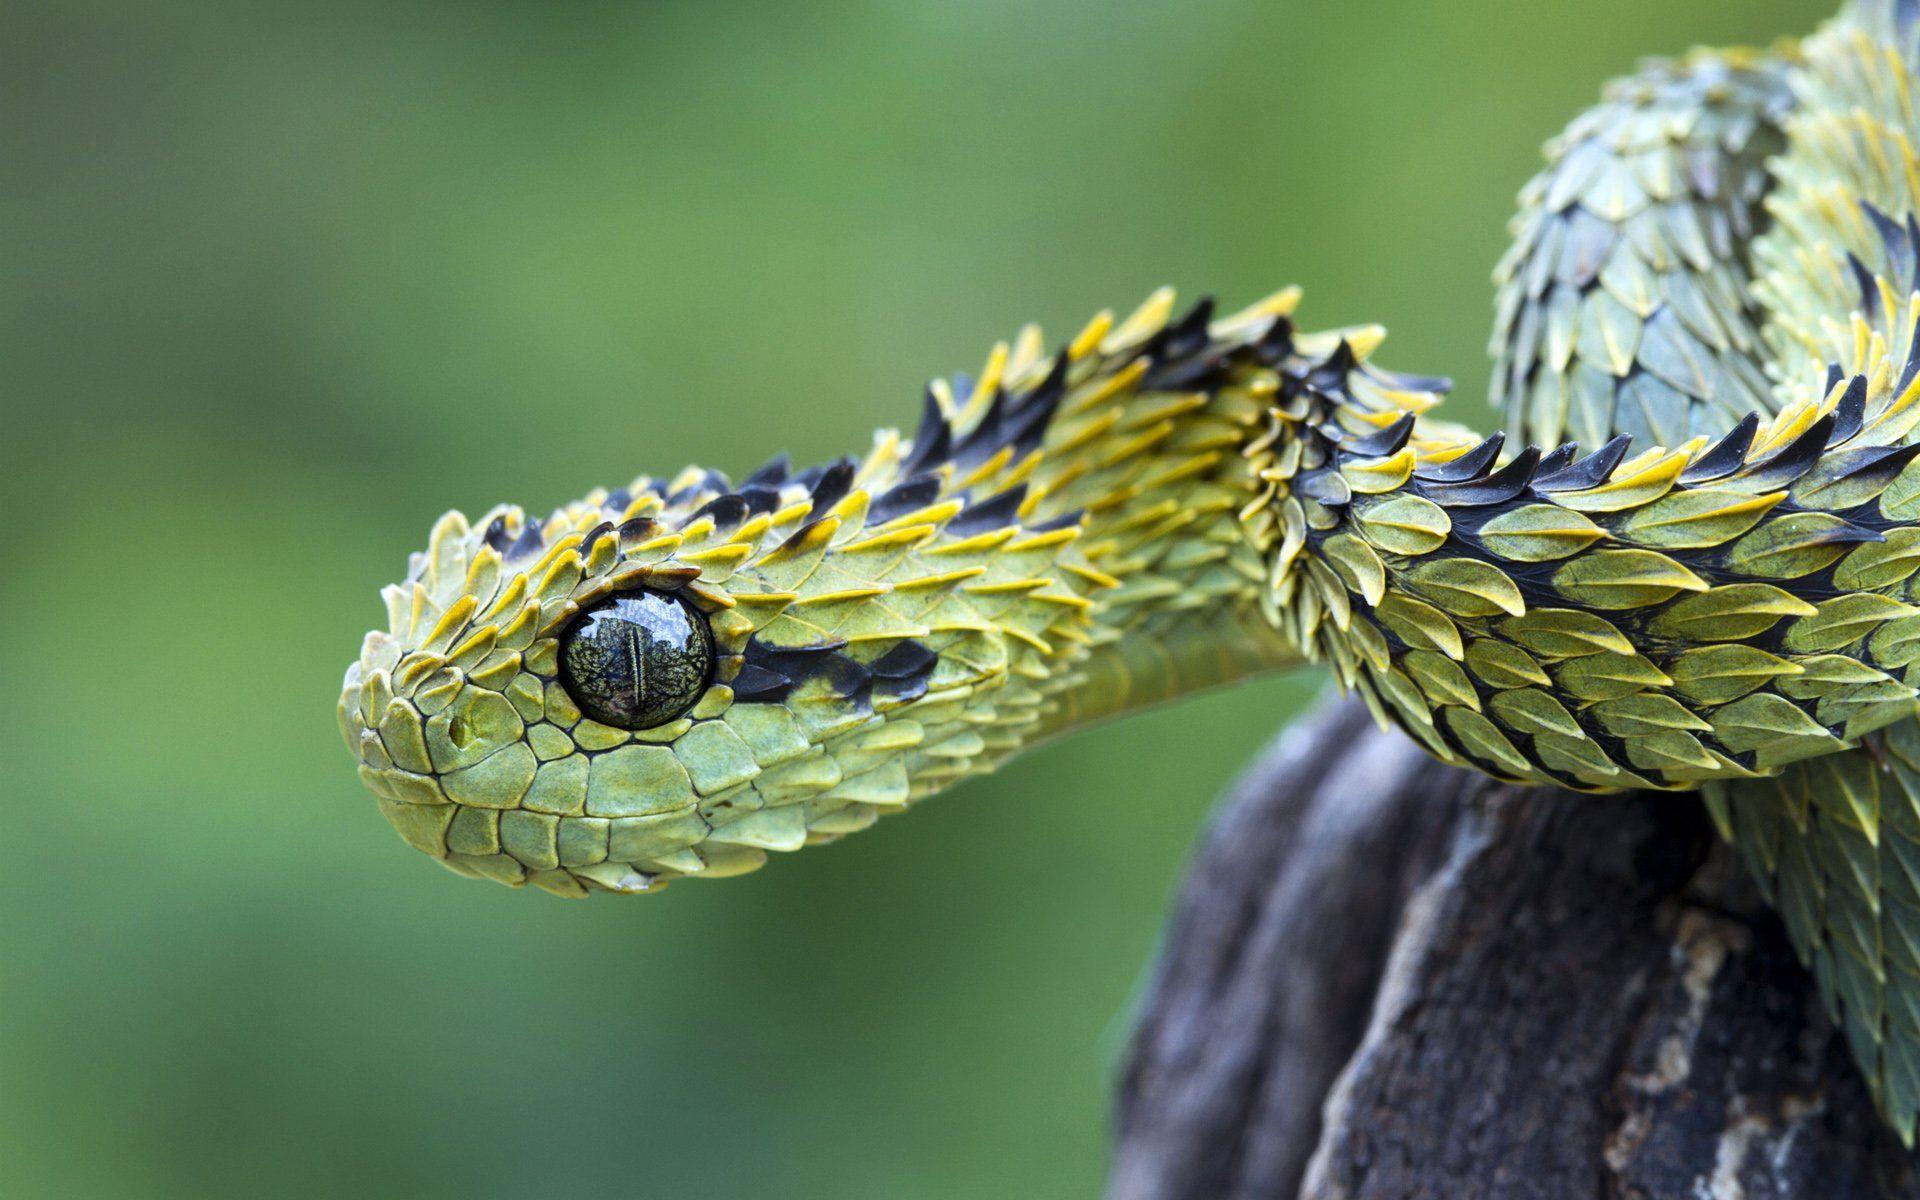 H D Reptiles Stoke 92+ Reptile And Fish S...